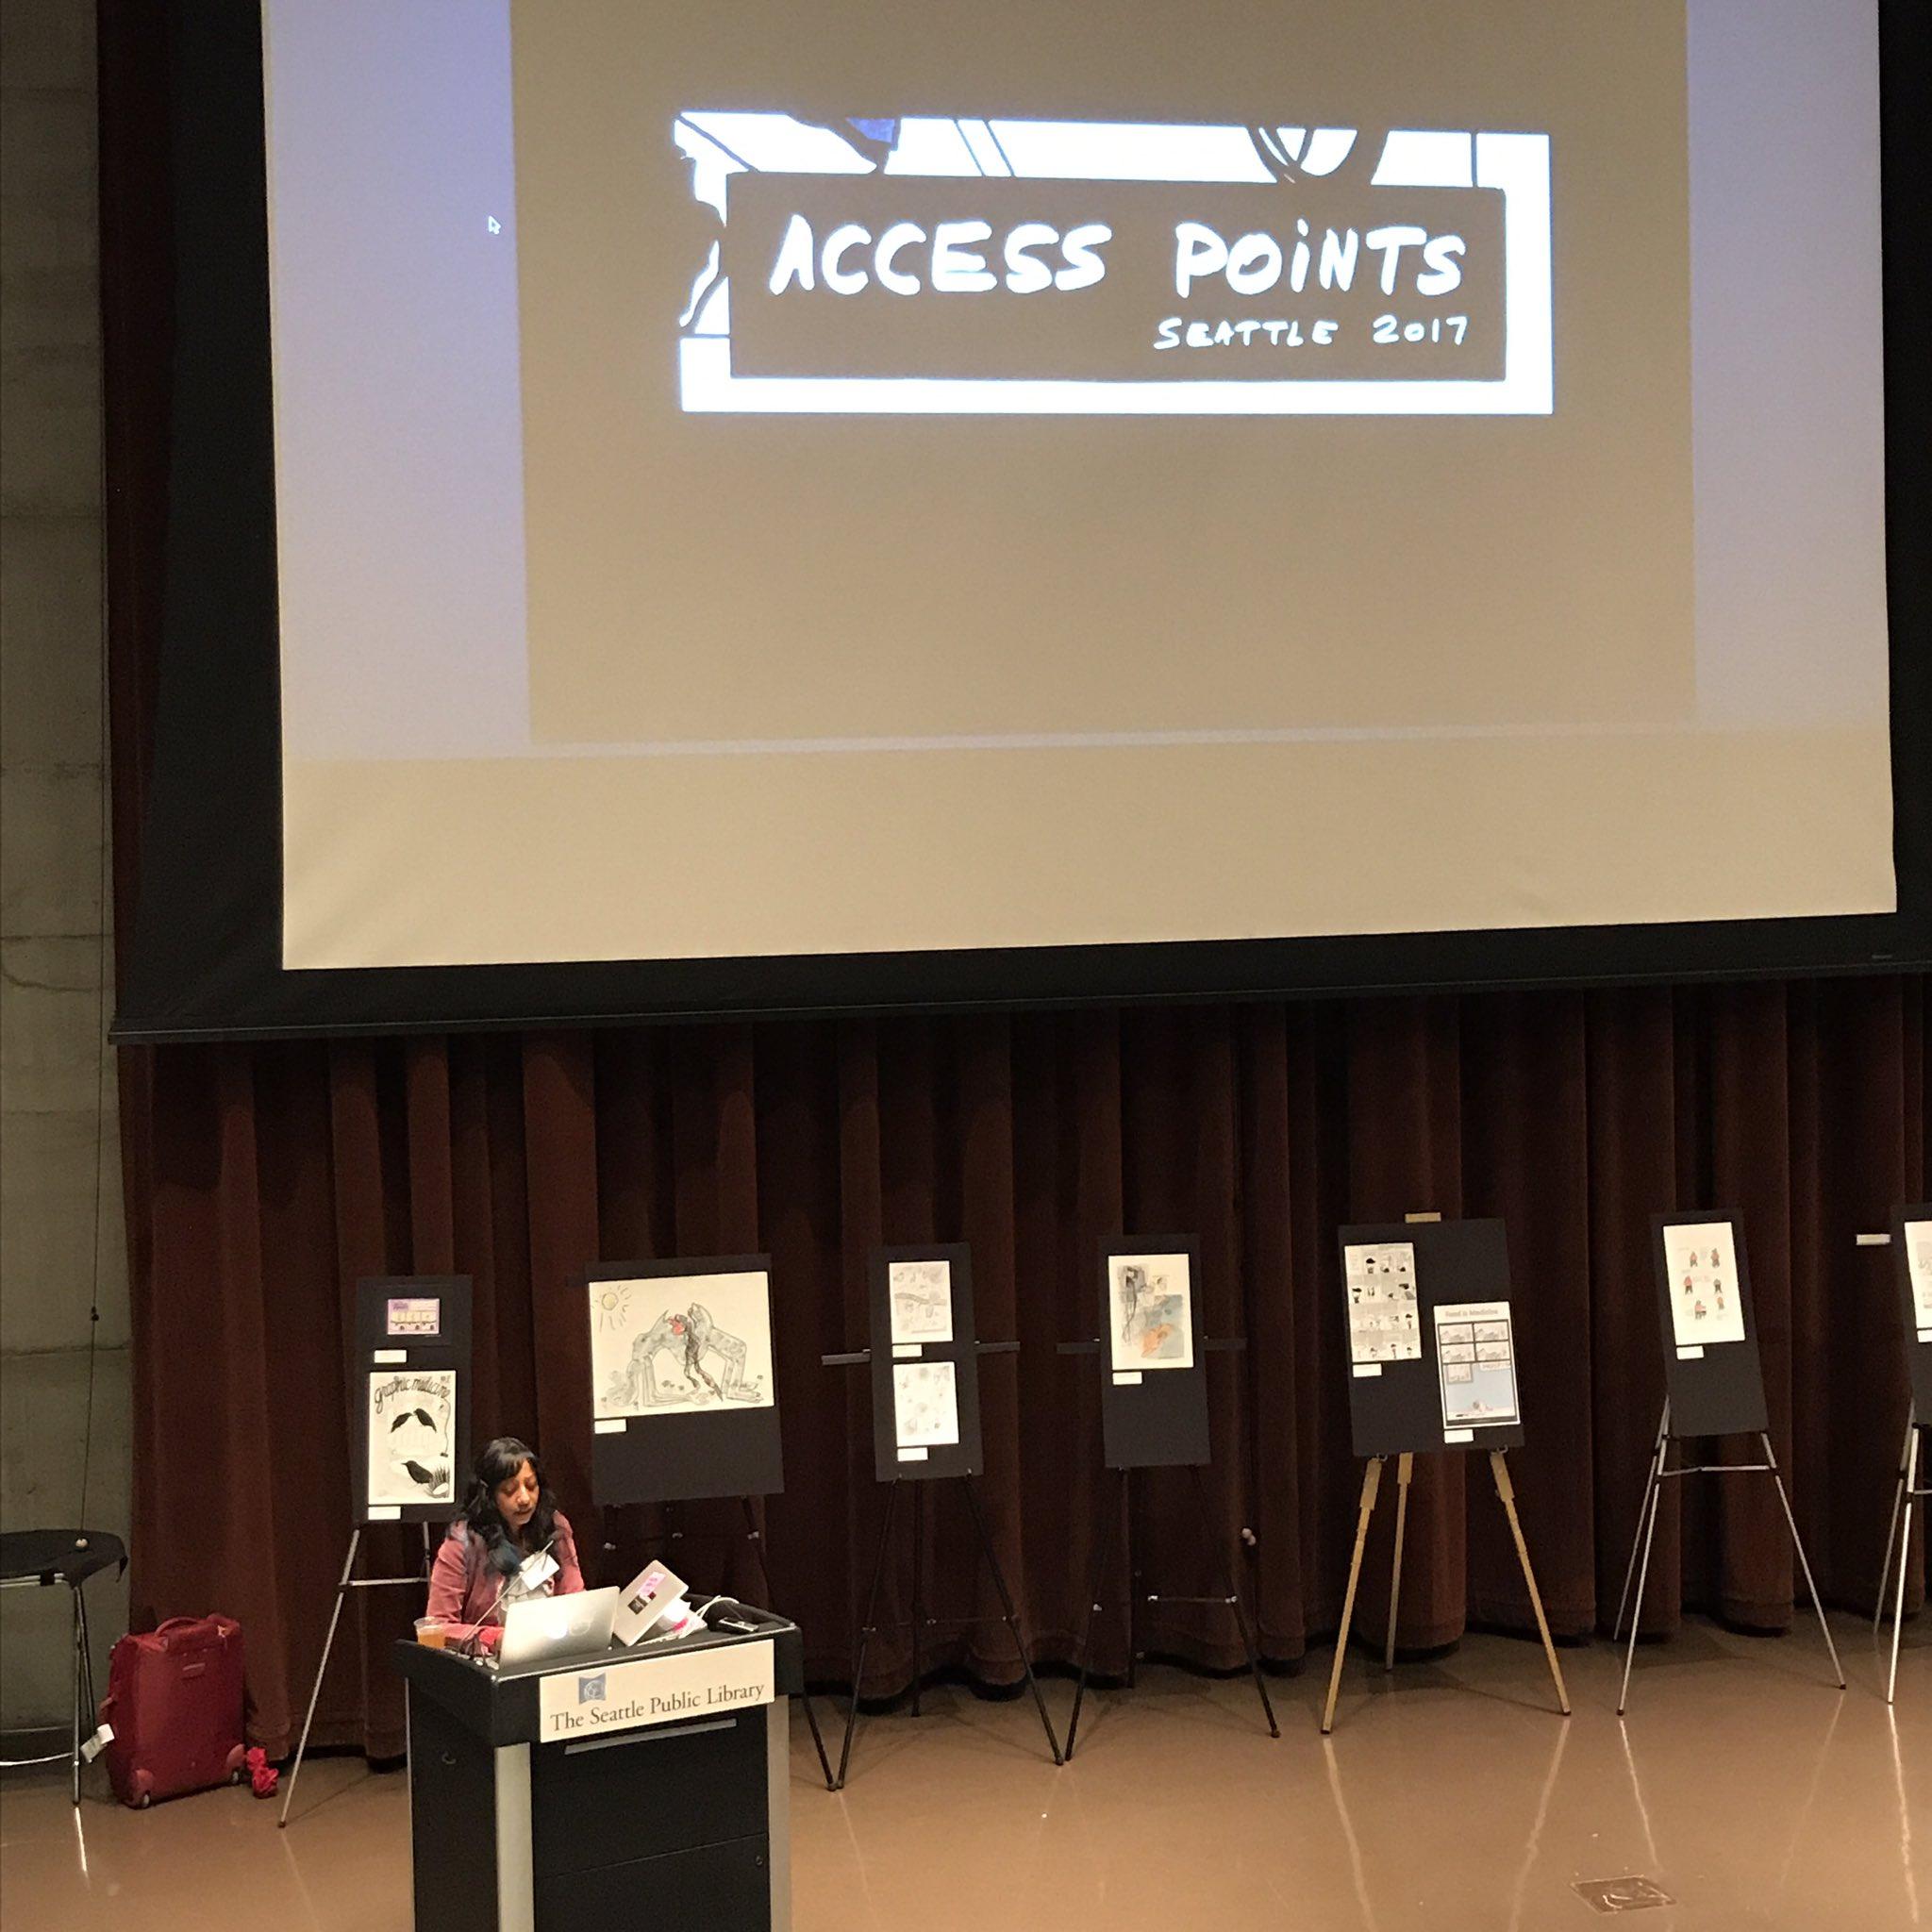 Access is about multiplicity #ComicsMedicineSeattle https://t.co/mMIEcNbvQ4